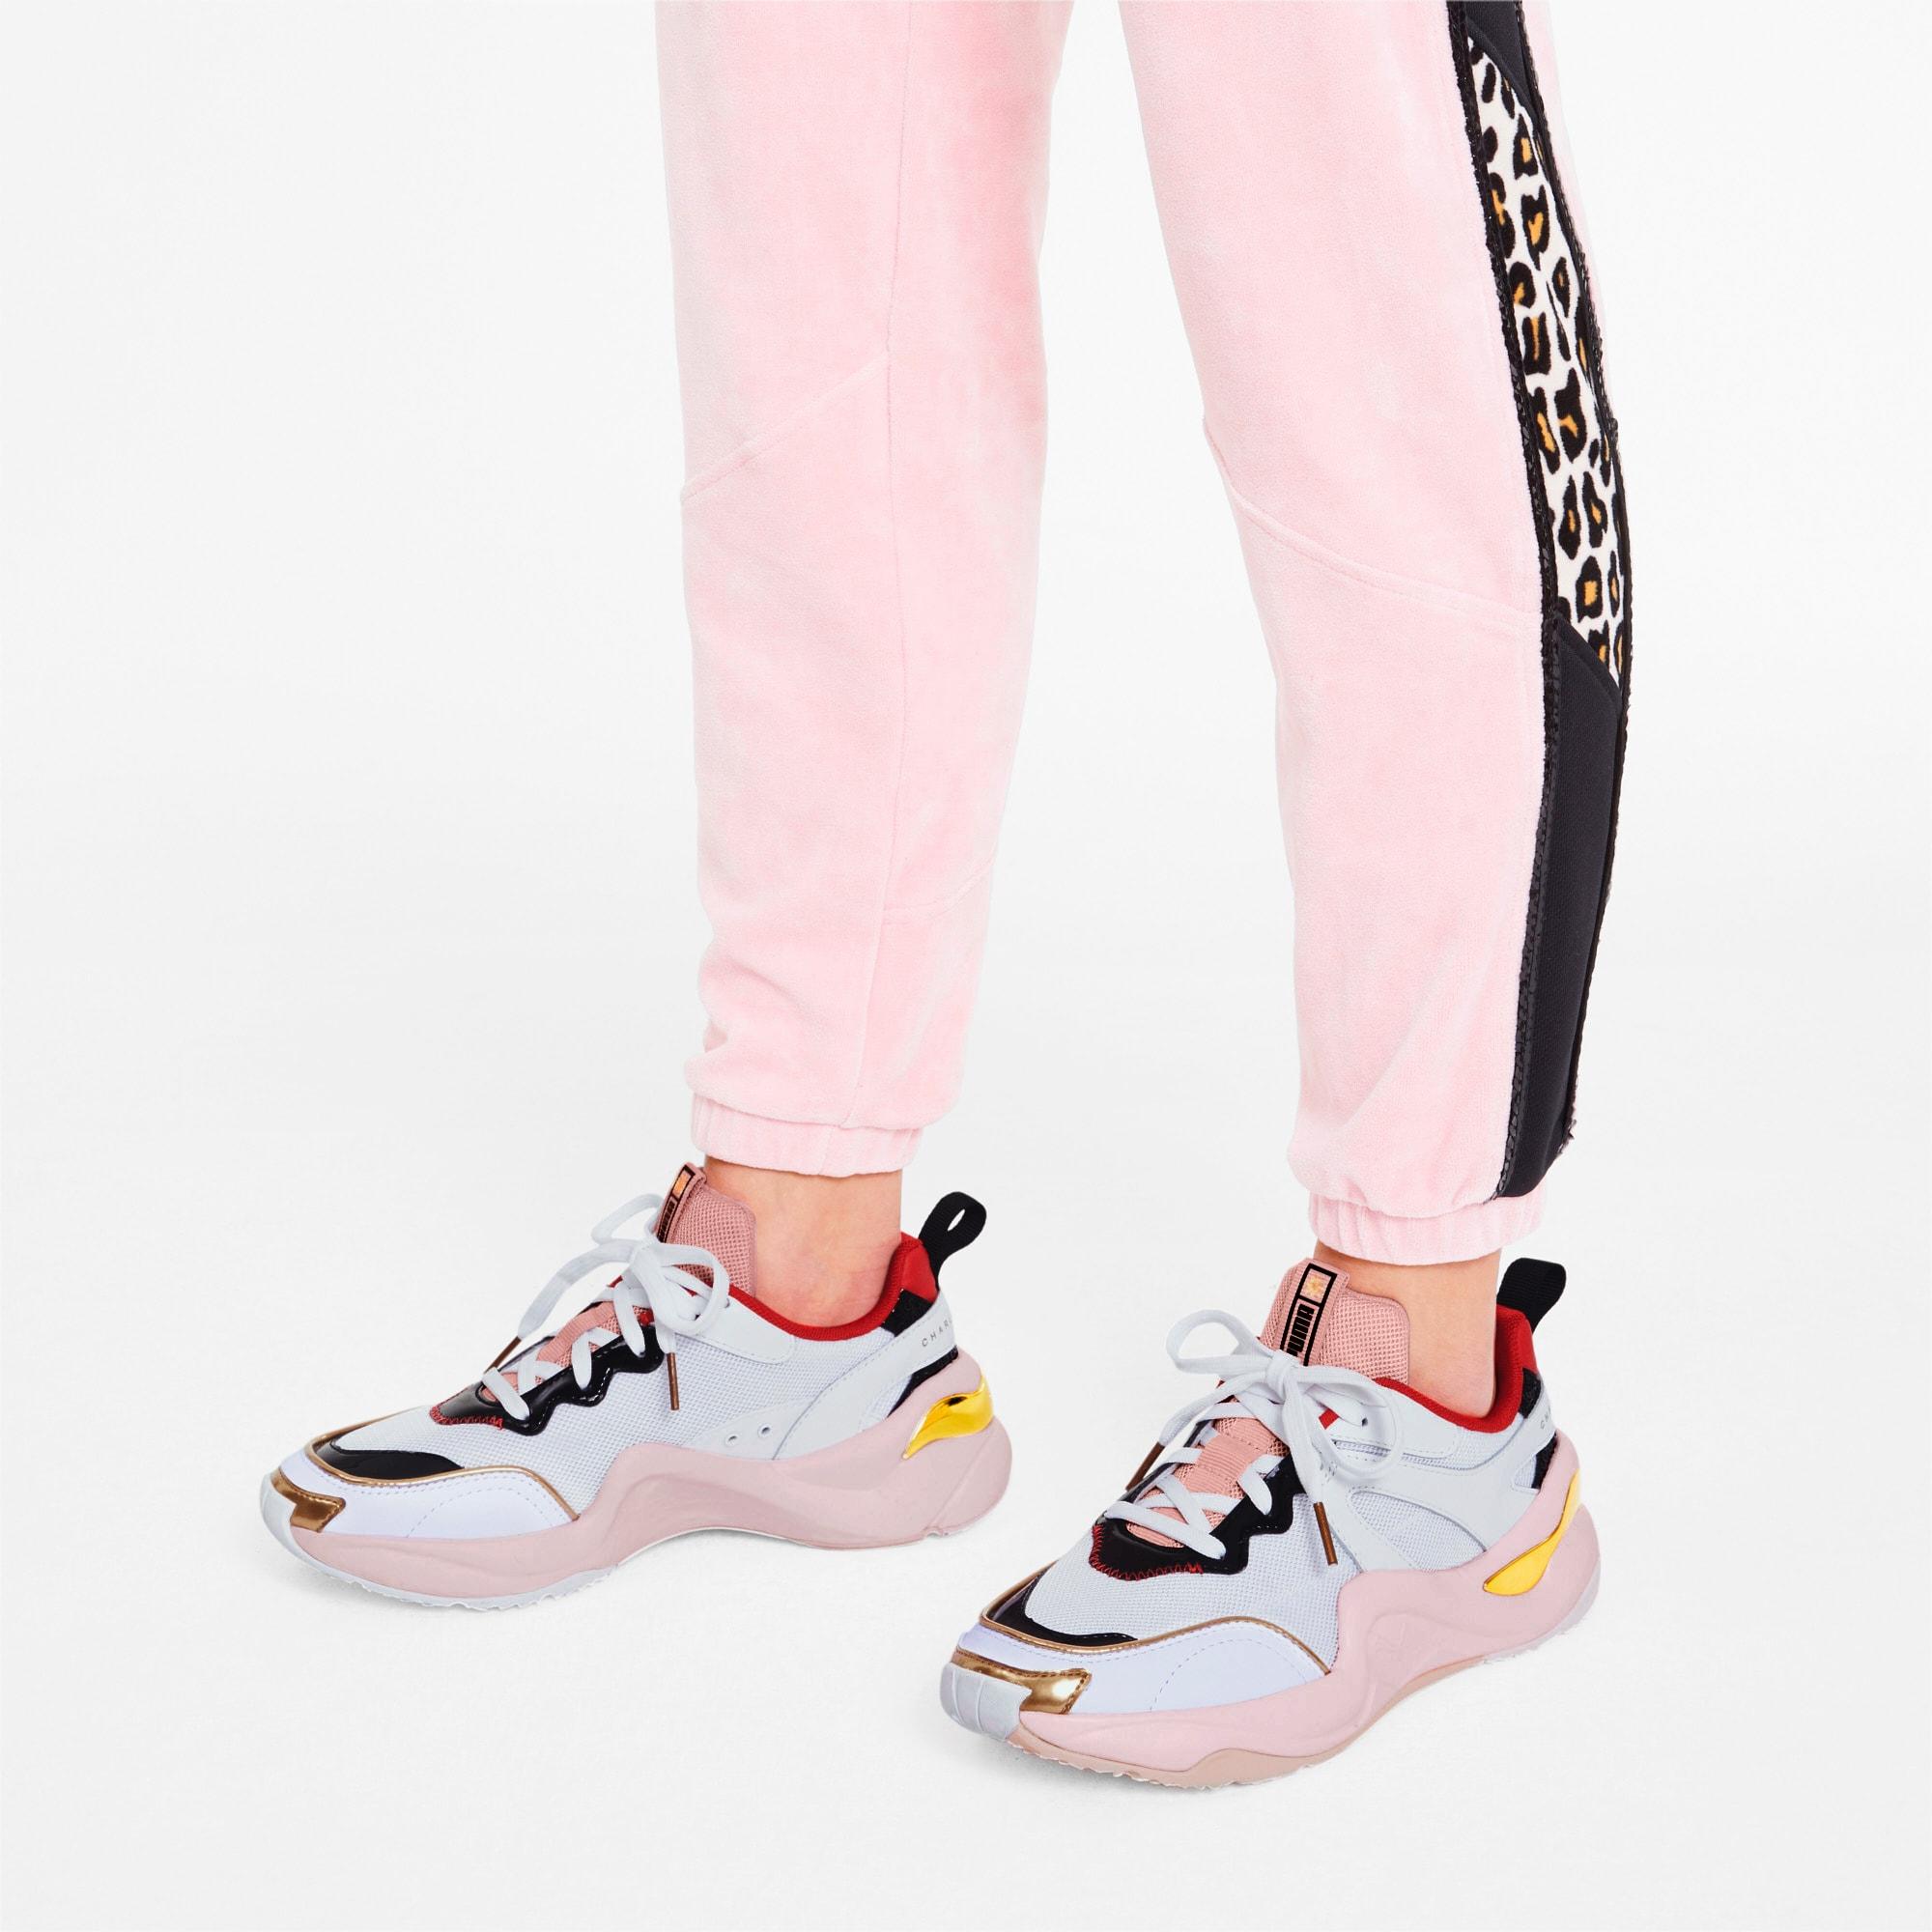 PUMA x CHARLOTTE OLYMPIA Rise Women's Sneakers